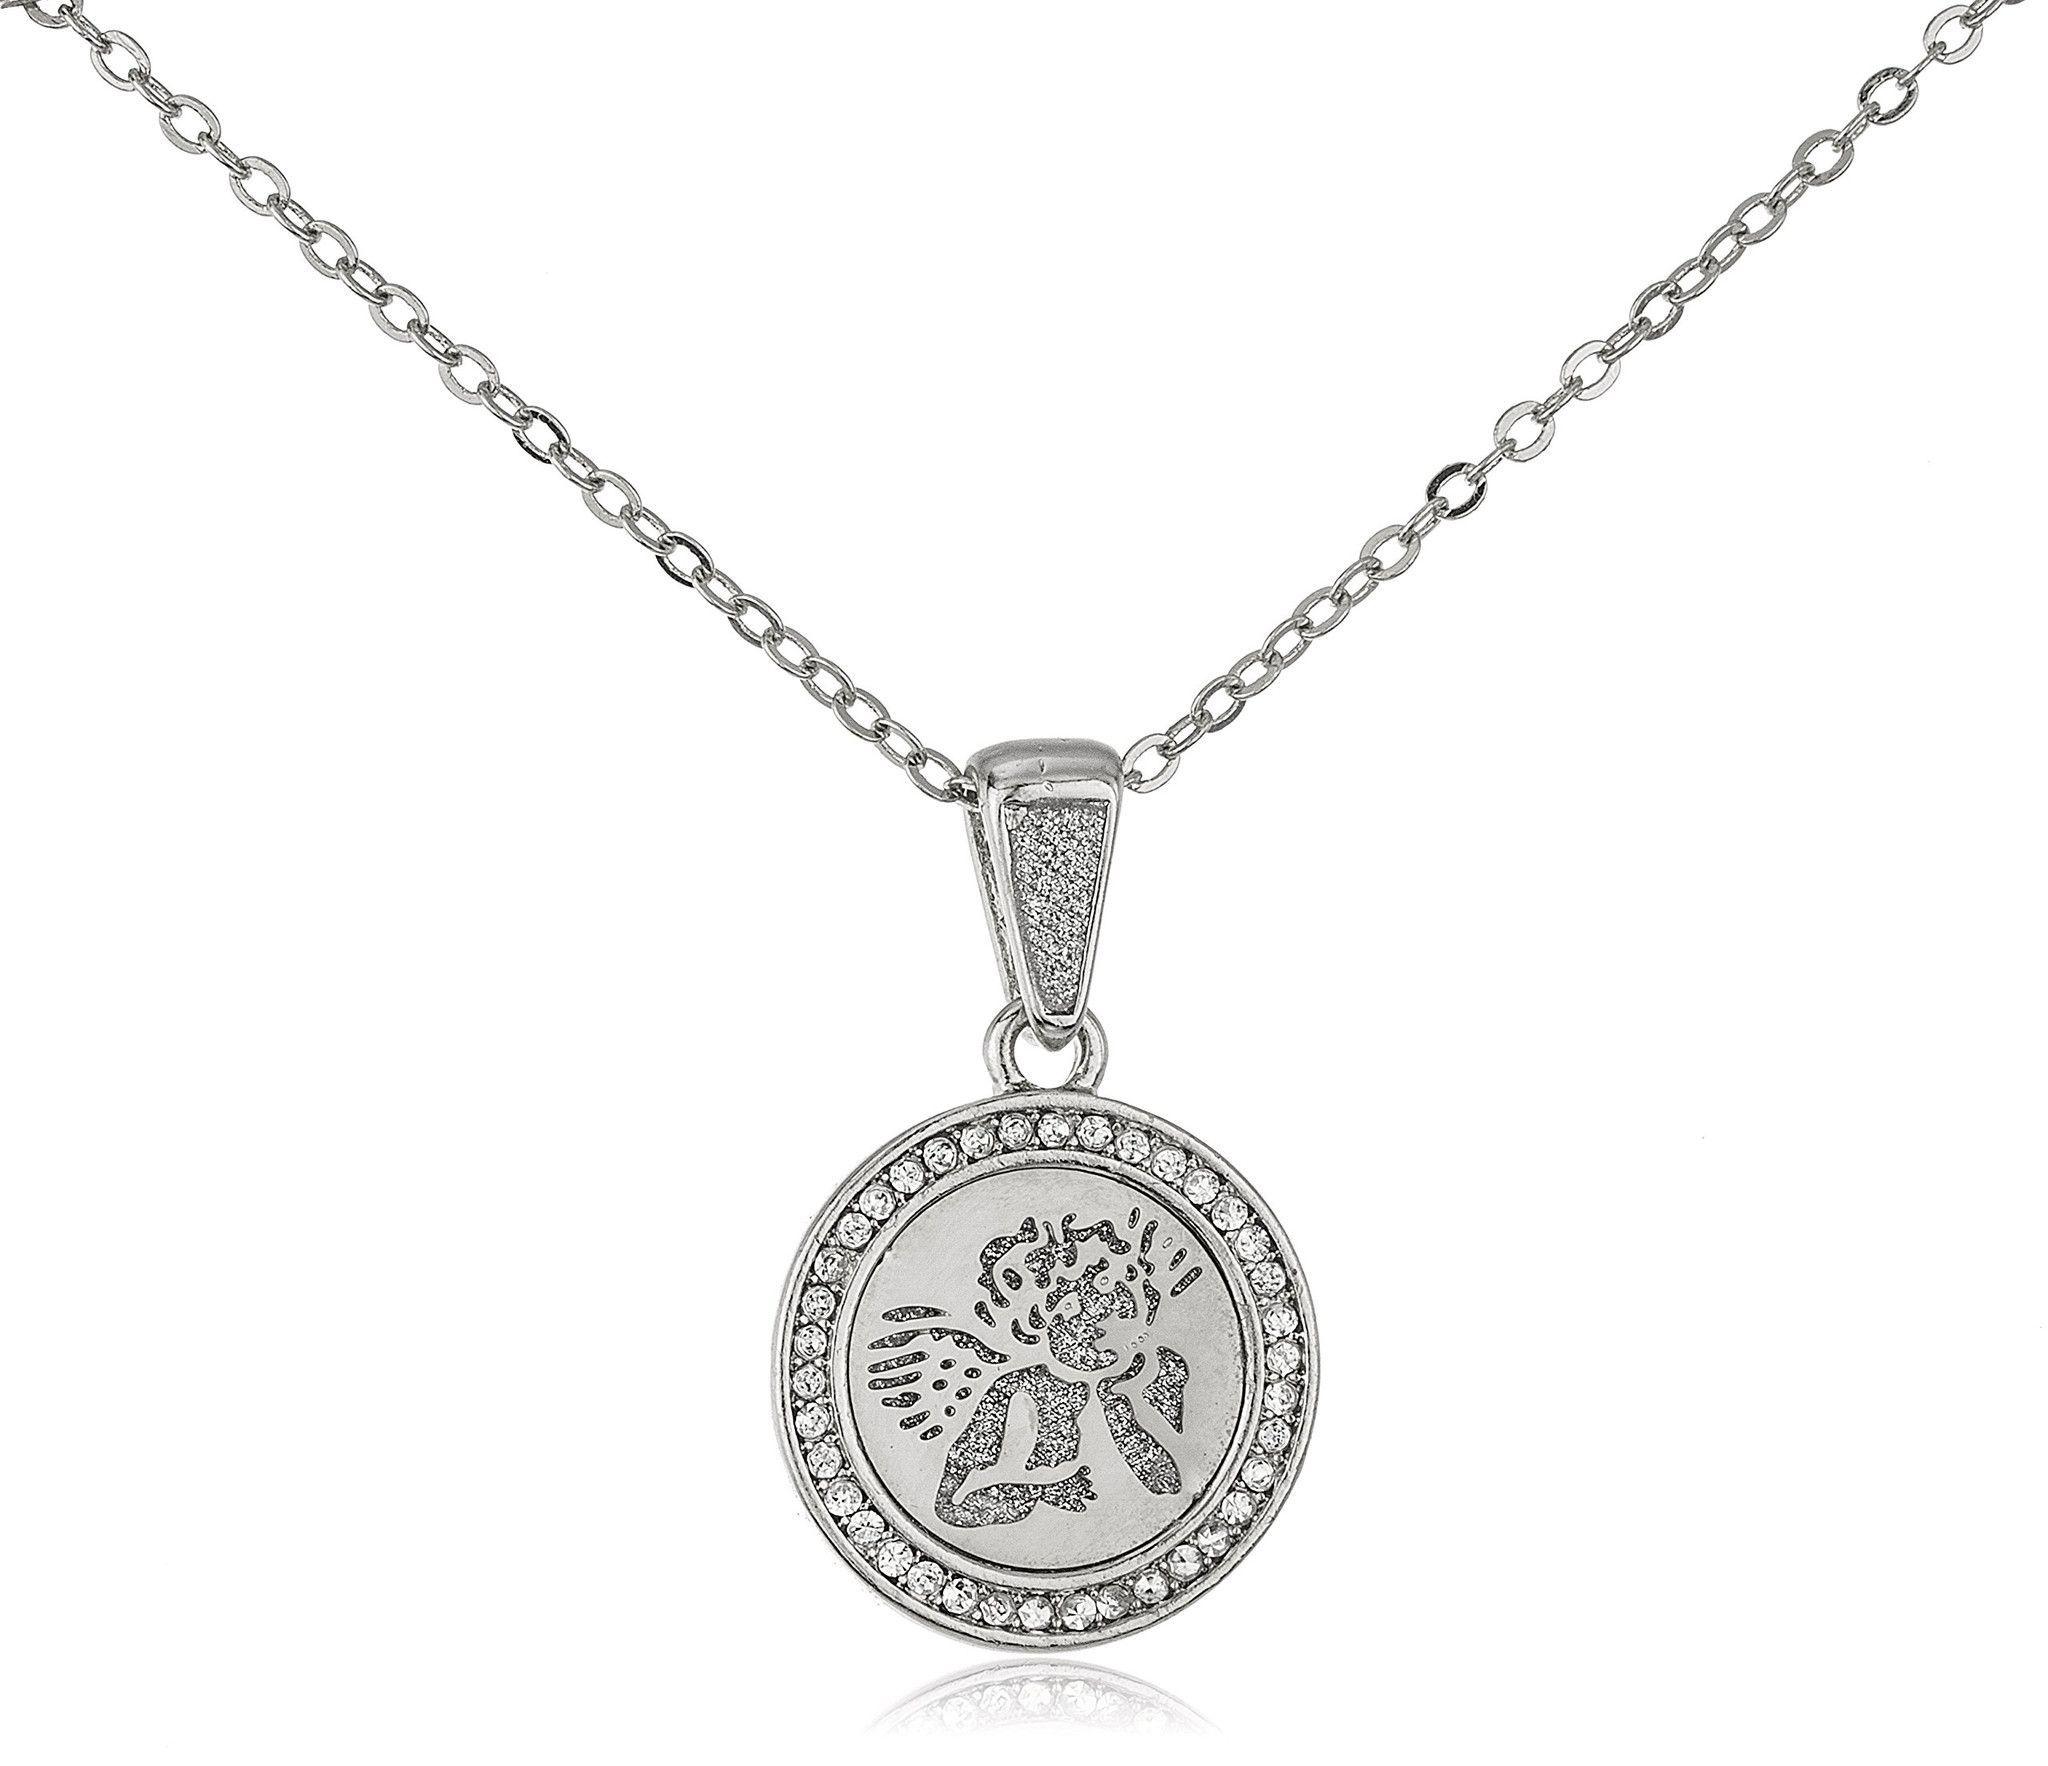 Stainless Steel Cherub Angel Sandblast Pendant on 19 Inch Link Necklace (Silvertone)